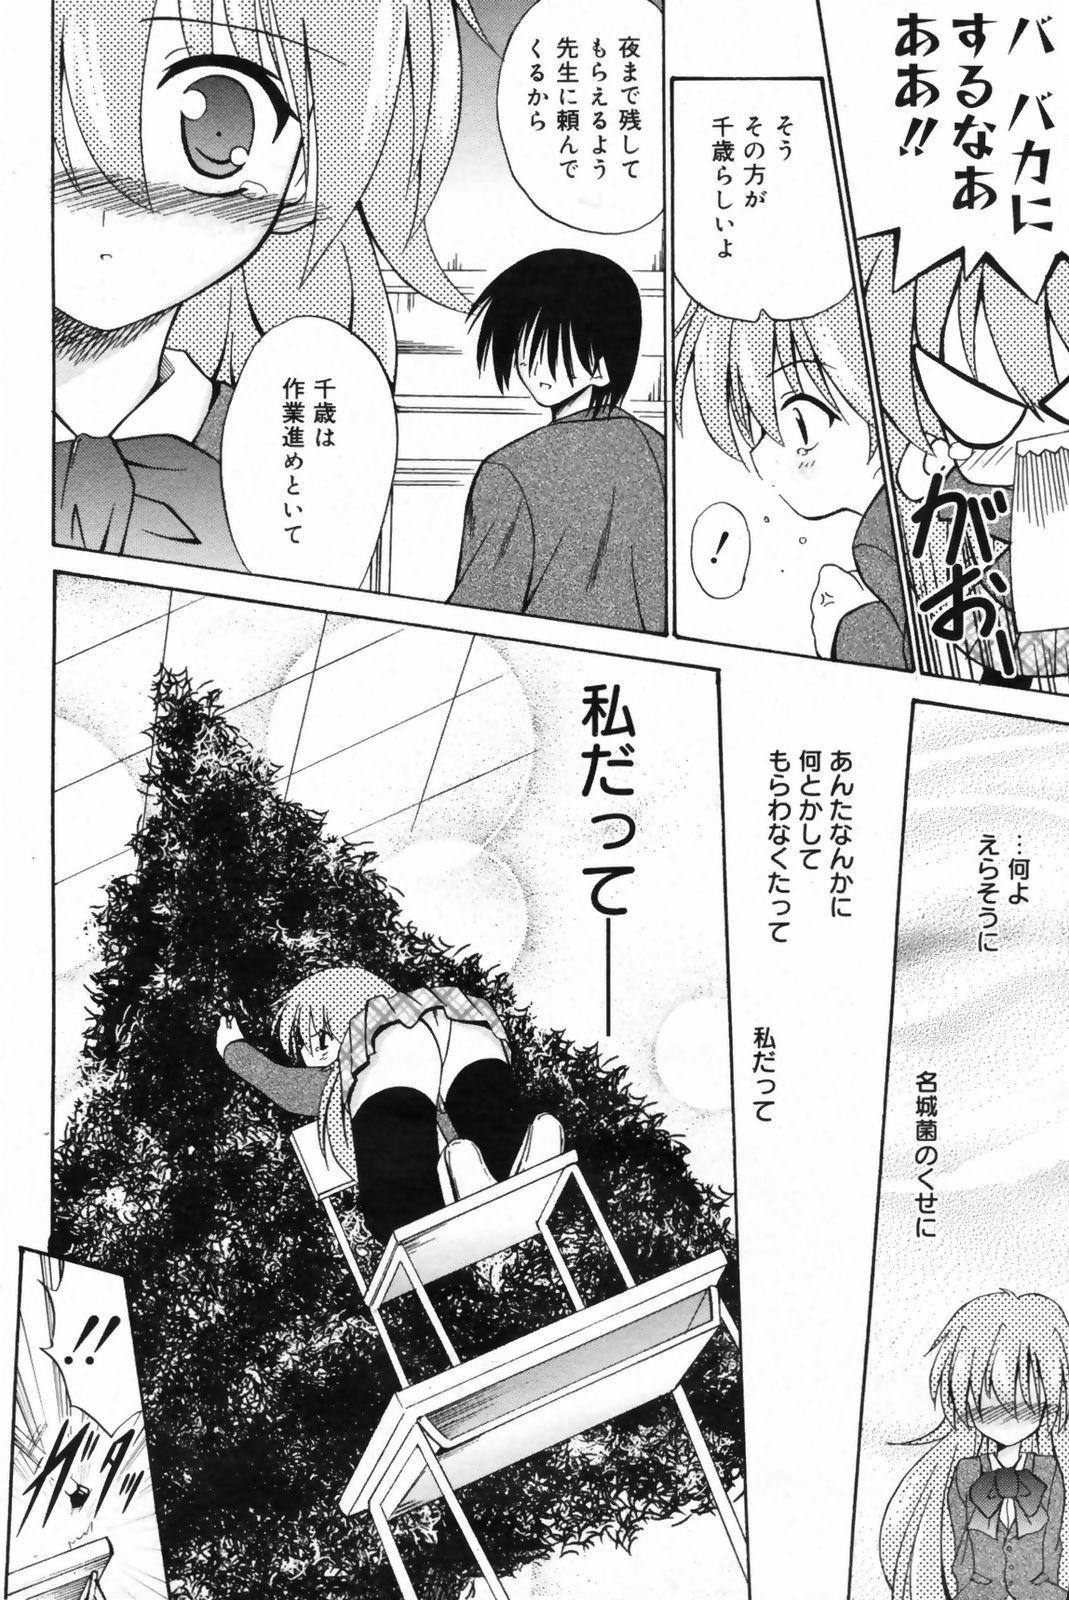 Manga Bangaichi 2009-02 Vol. 234 163